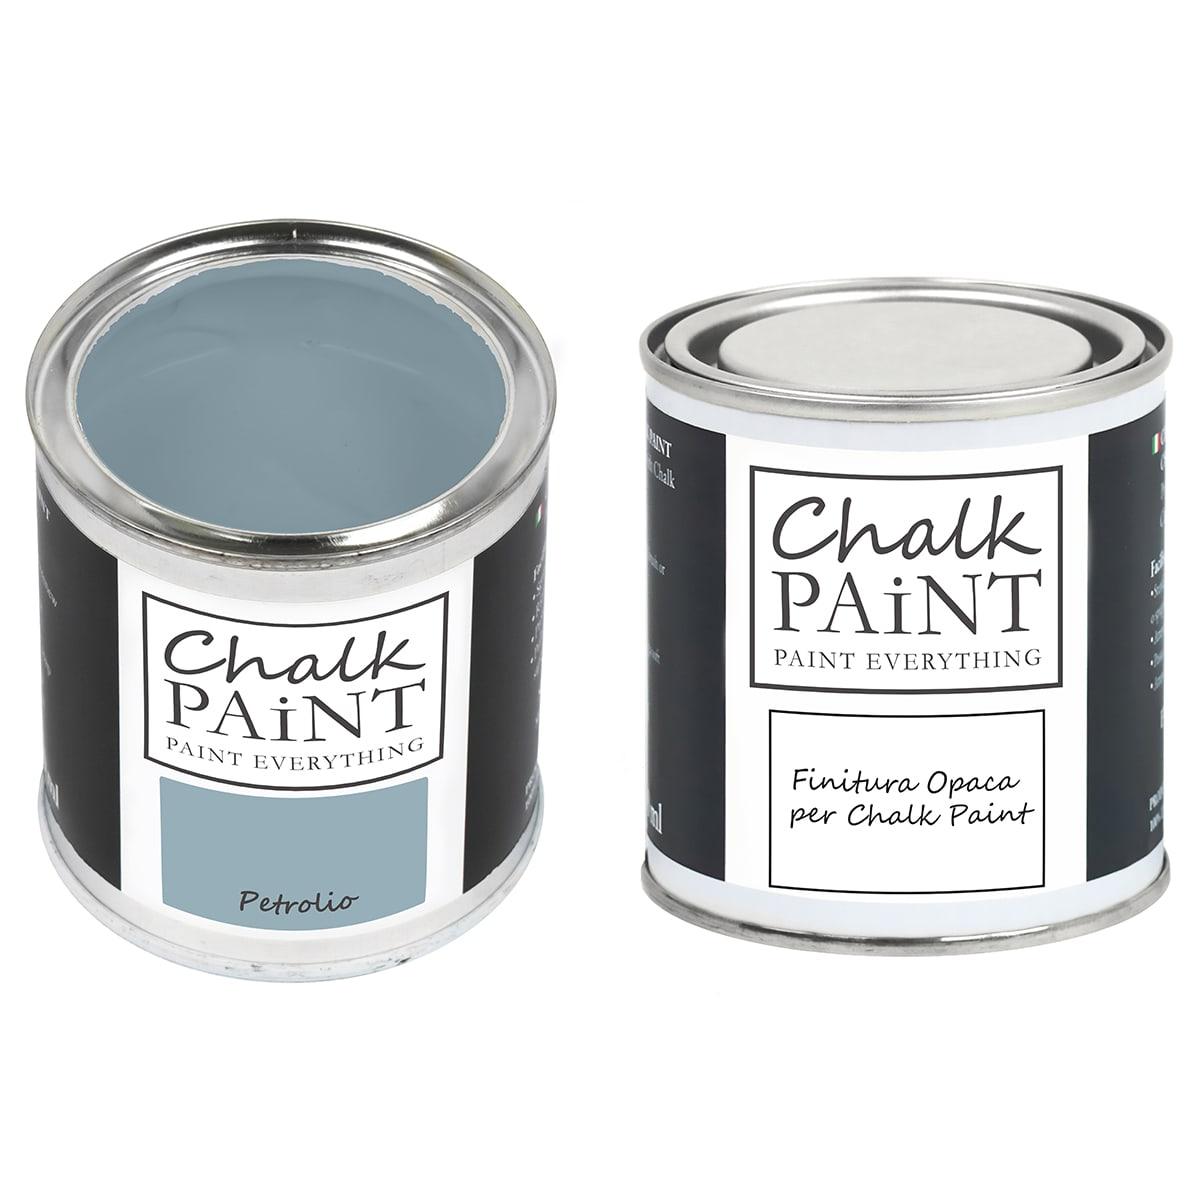 Chalk Paint petrolio + Finitura